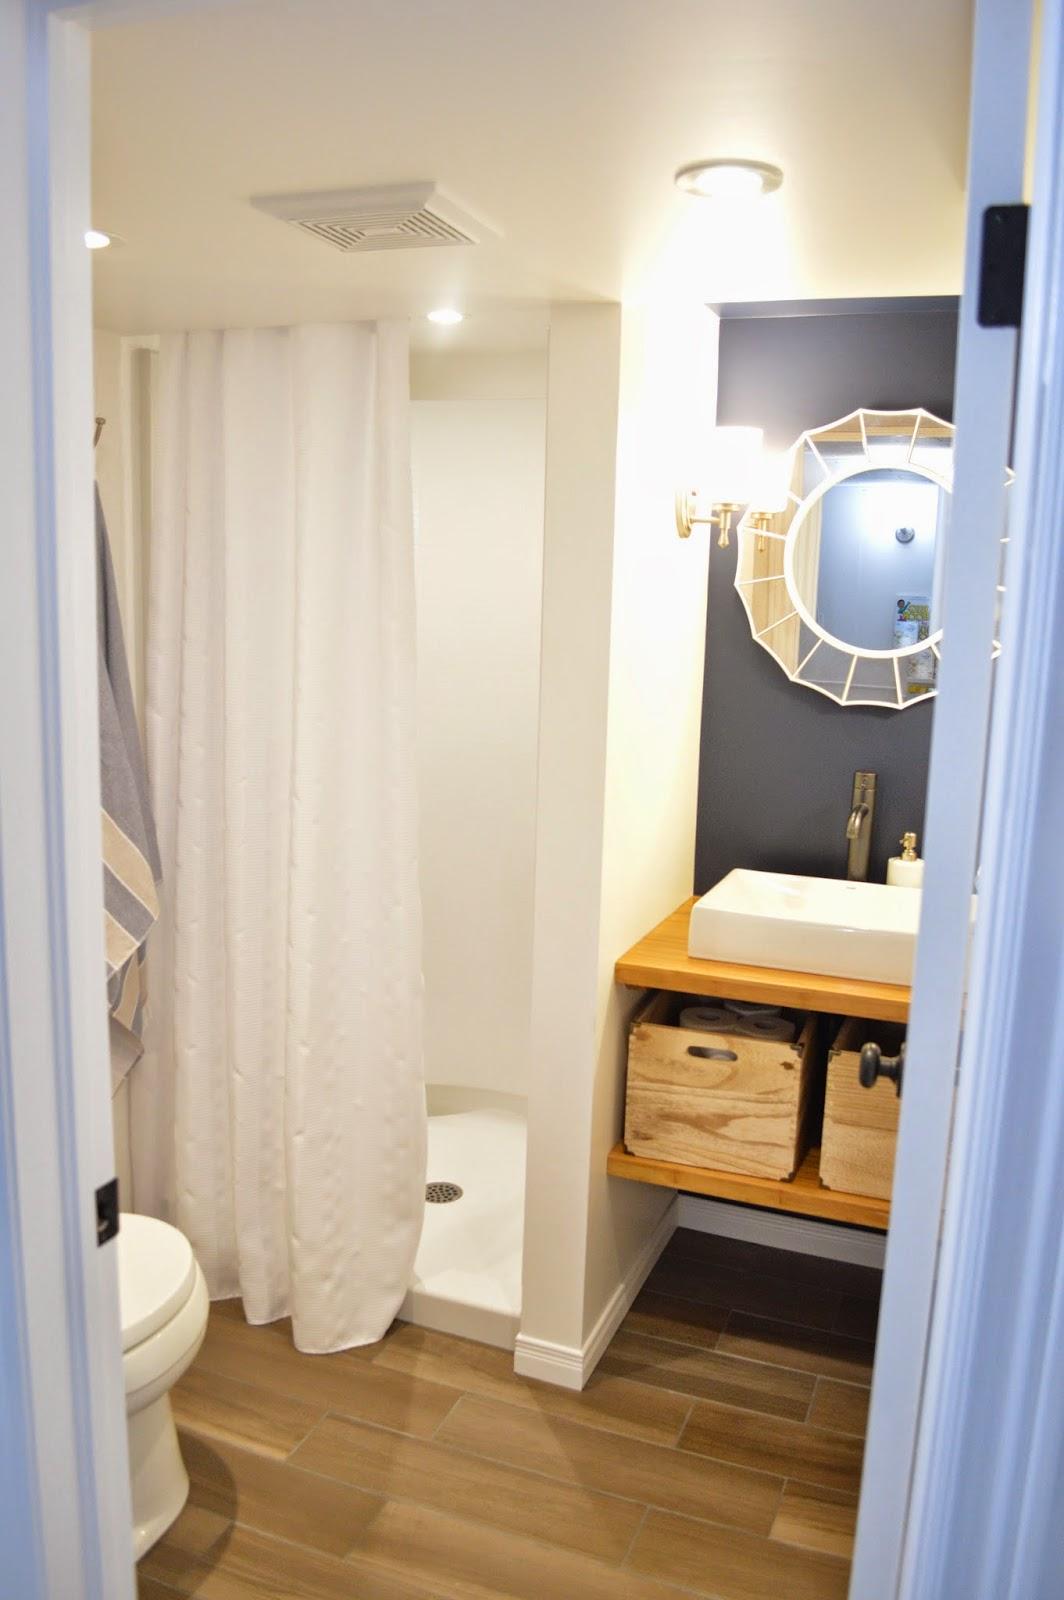 bathroom wraps. Bathroom Wraps N